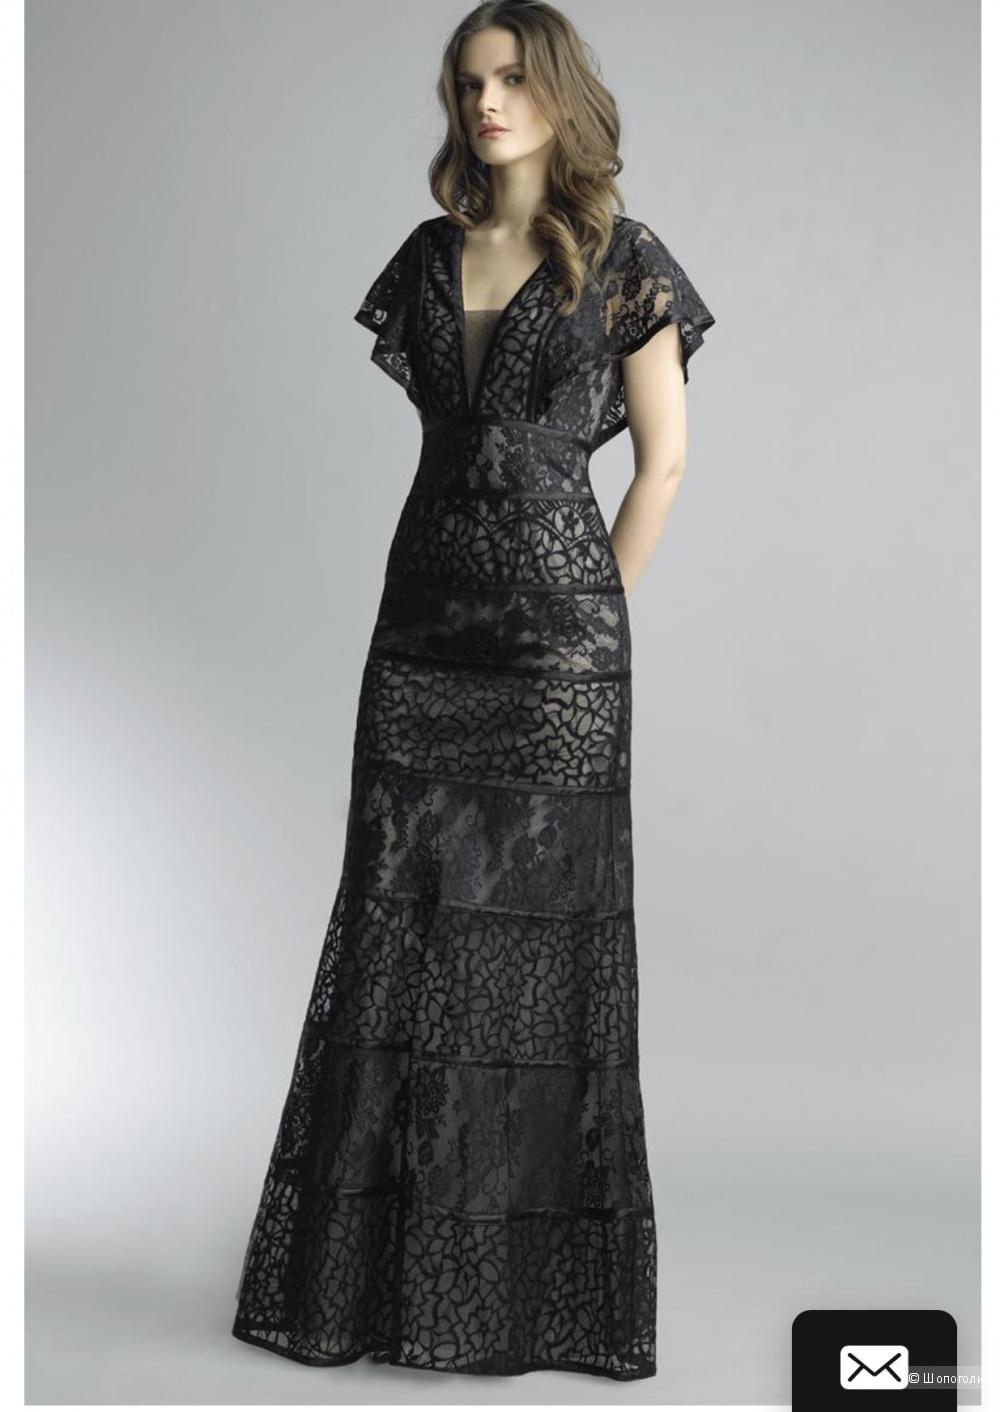 Платье basix black label 4usa/44/s-m